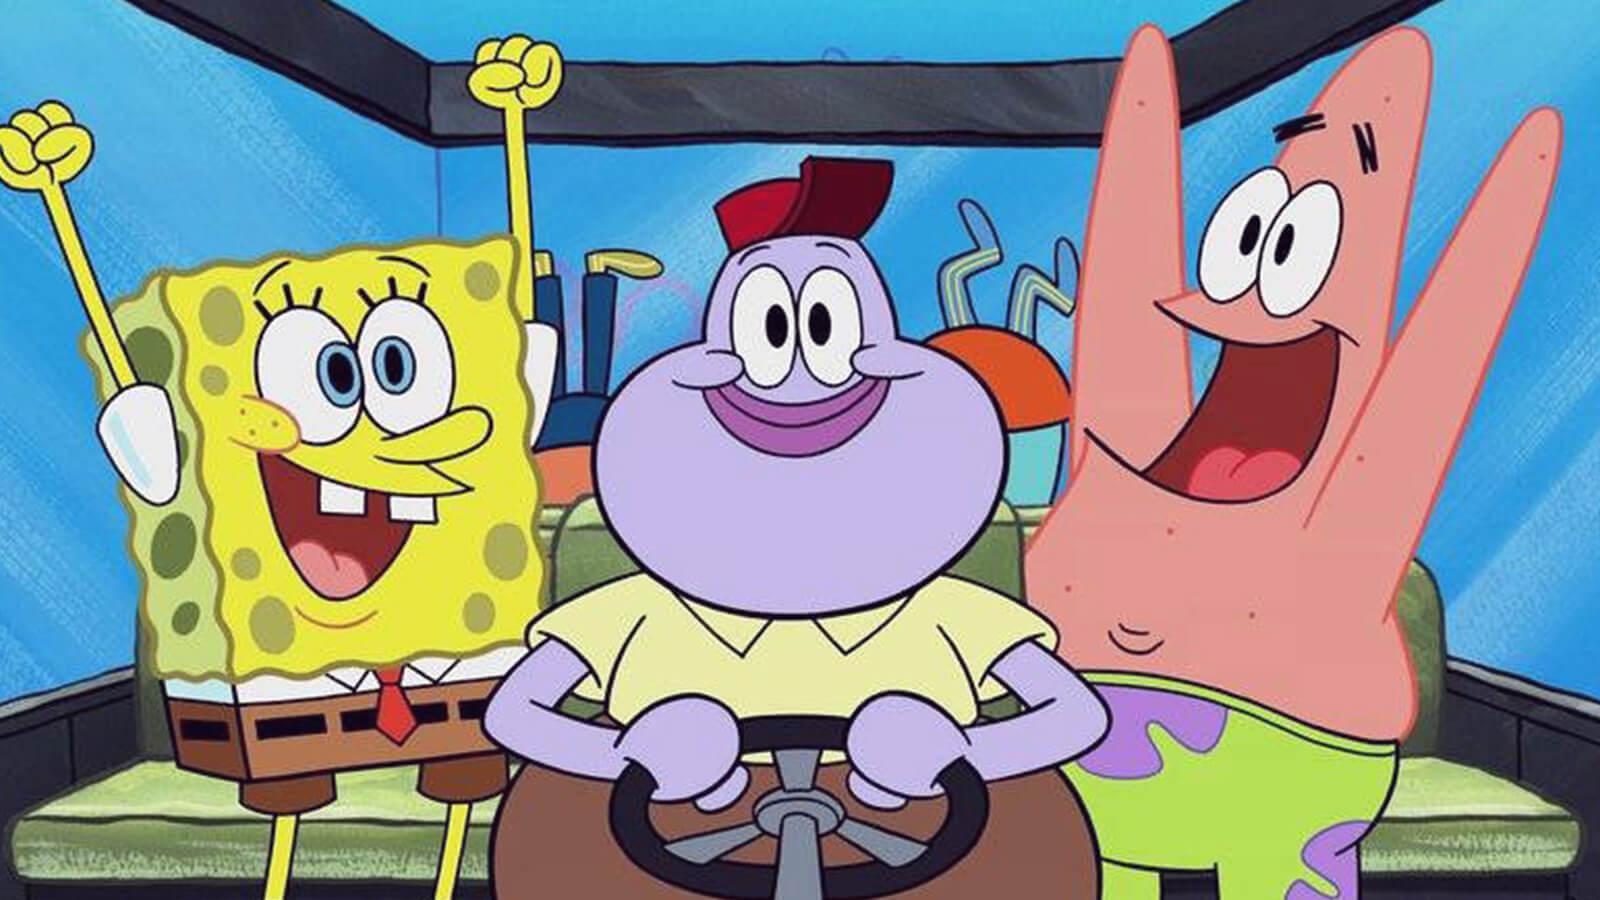 SpongeBob from SpongeBob SquarePants